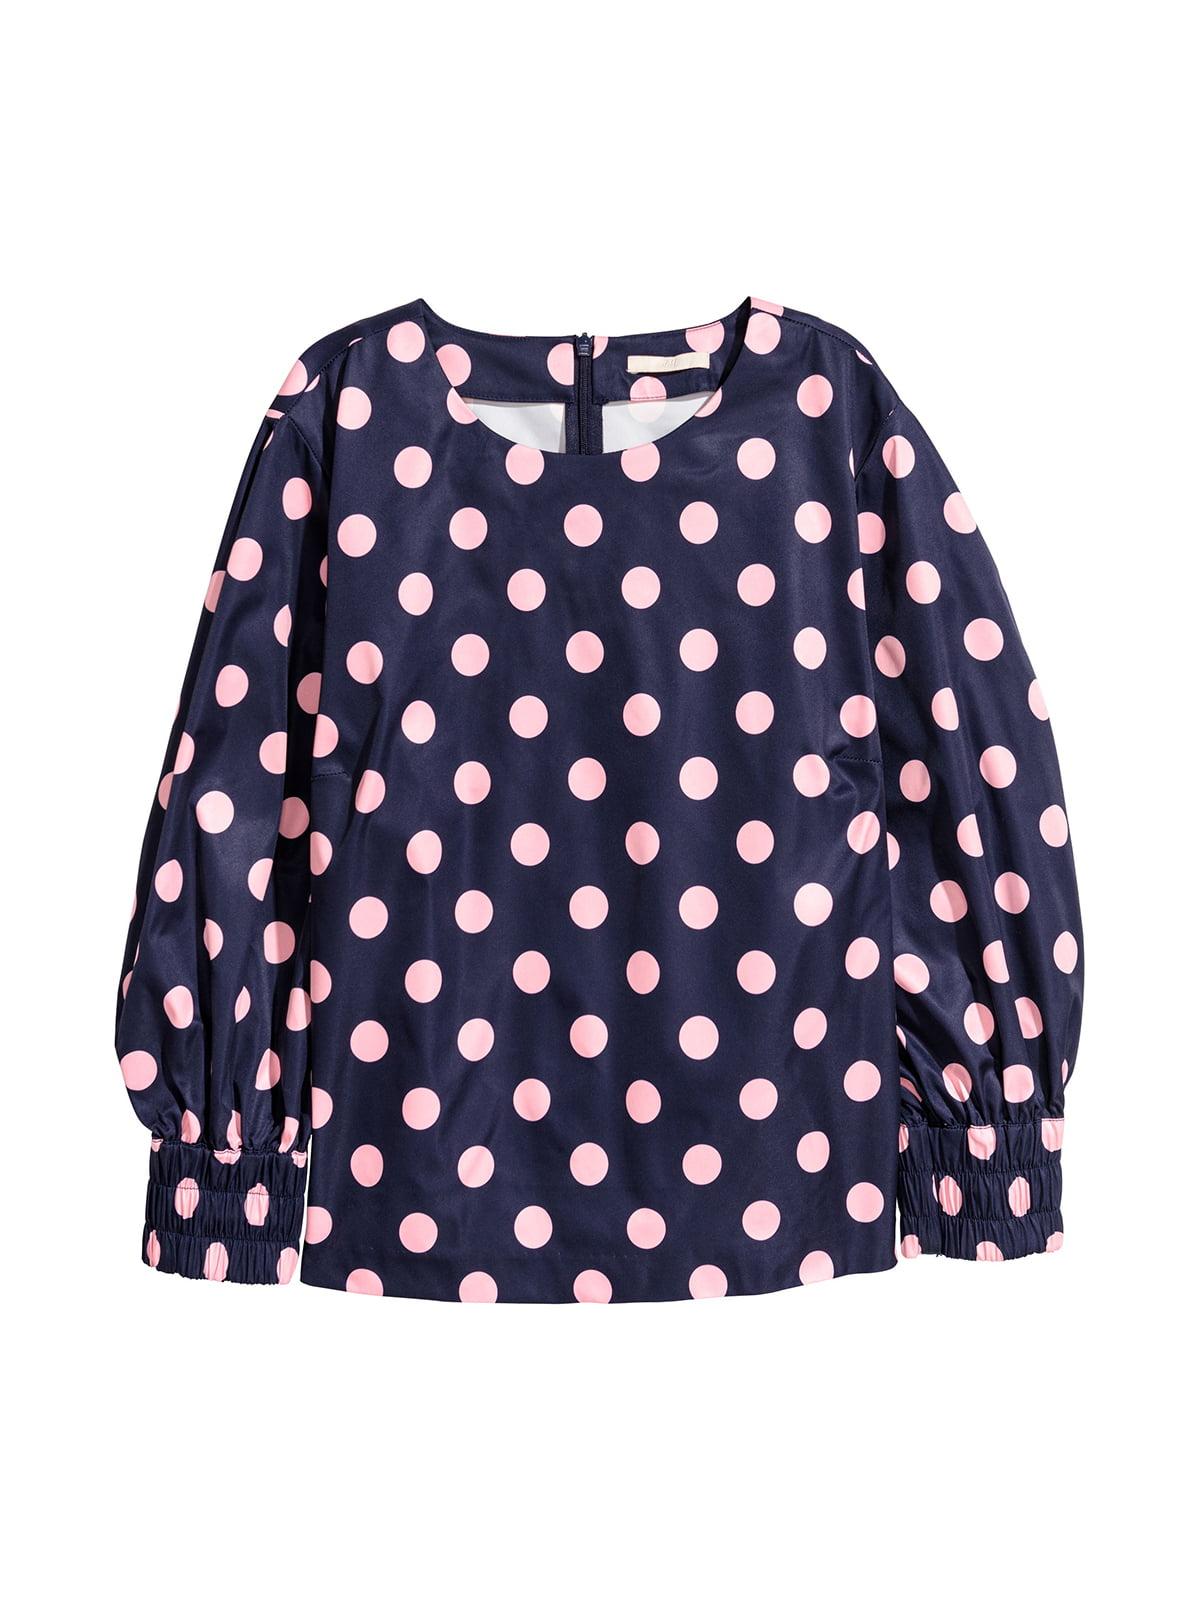 Блуза темно-синяя в горошек | 5667318